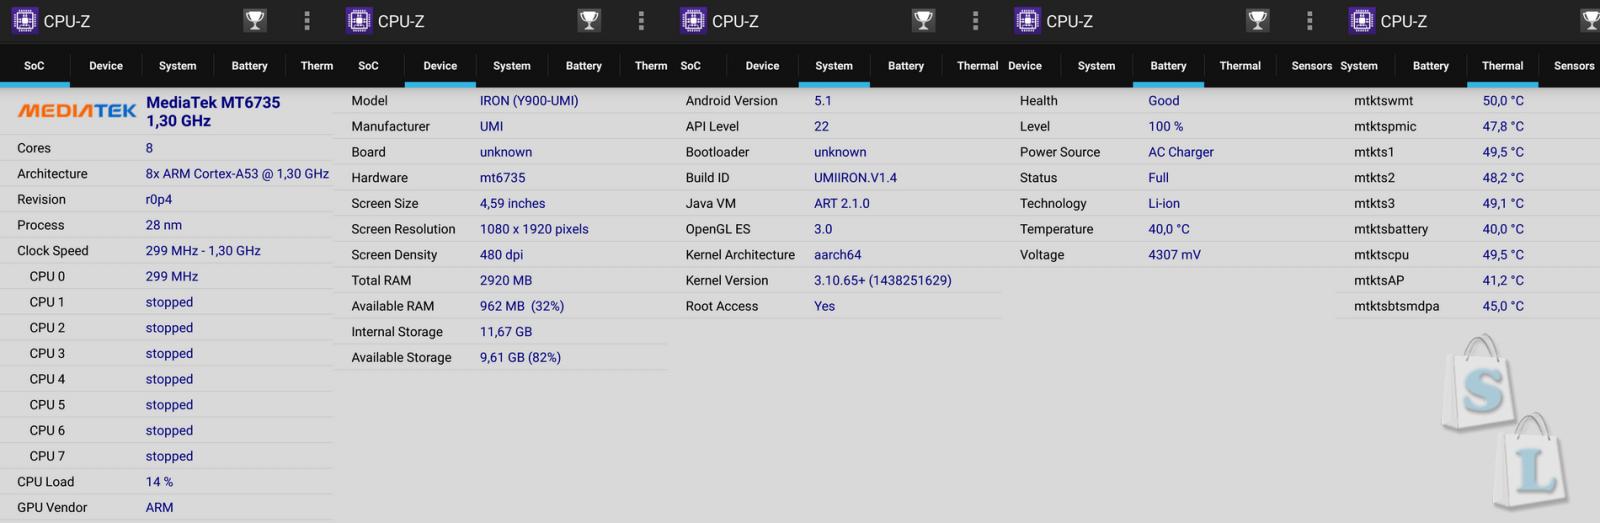 CooliCool: Полный обзор UMI IRON MTK6753 1.3GHz Octa Core 5.5 Inch